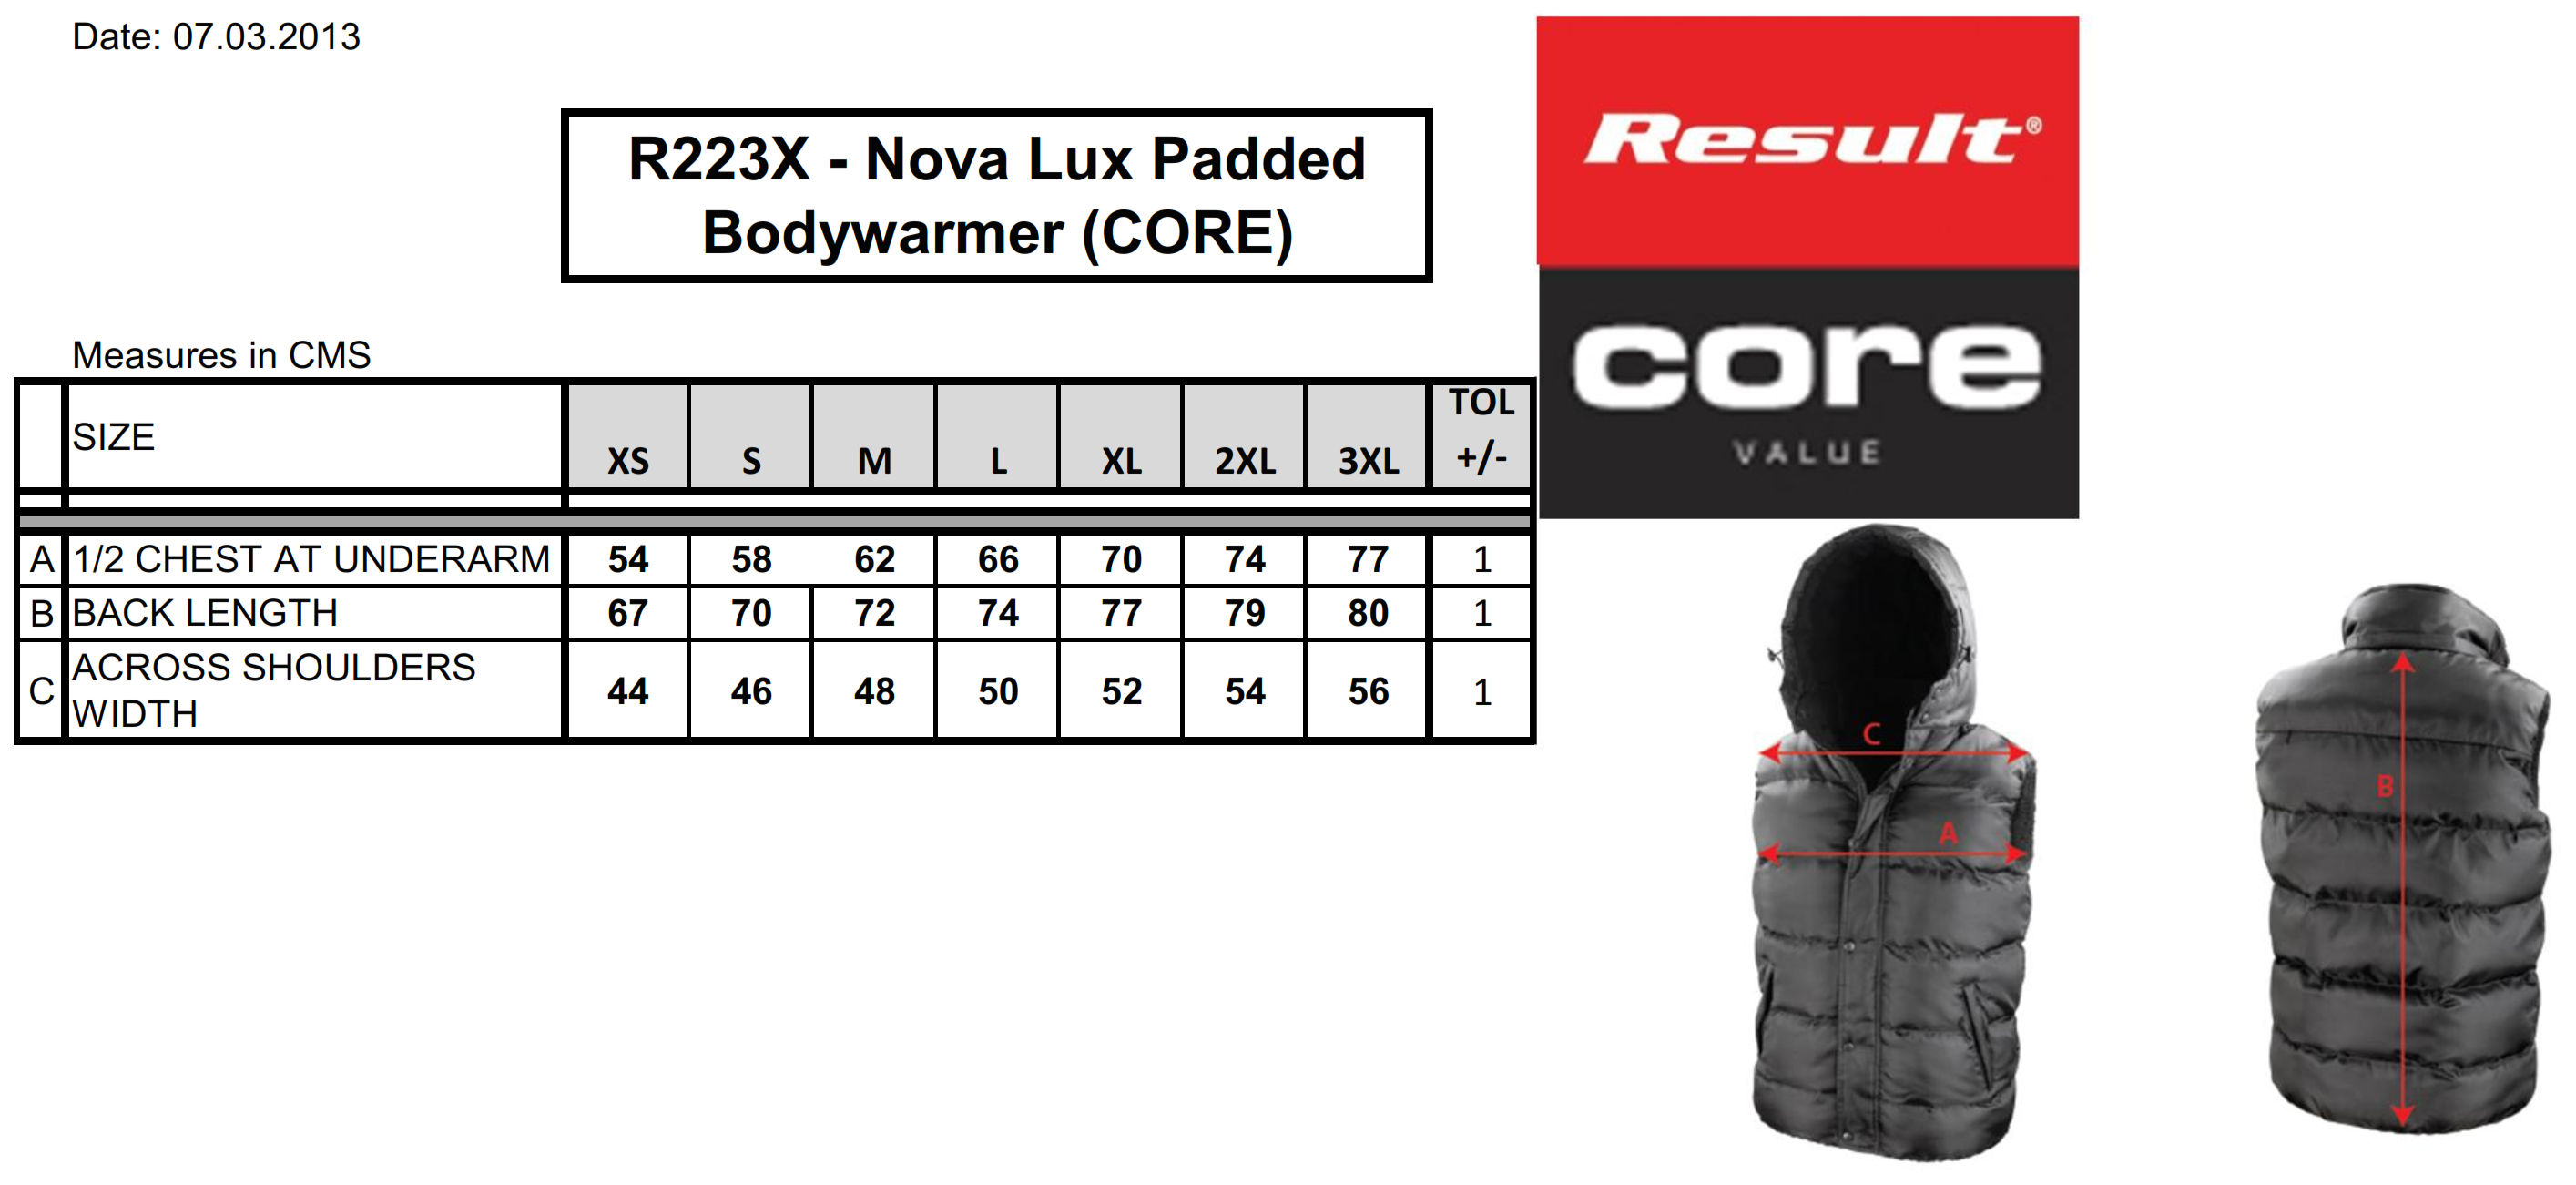 Result: Nova Lux Padded Gilet R223X